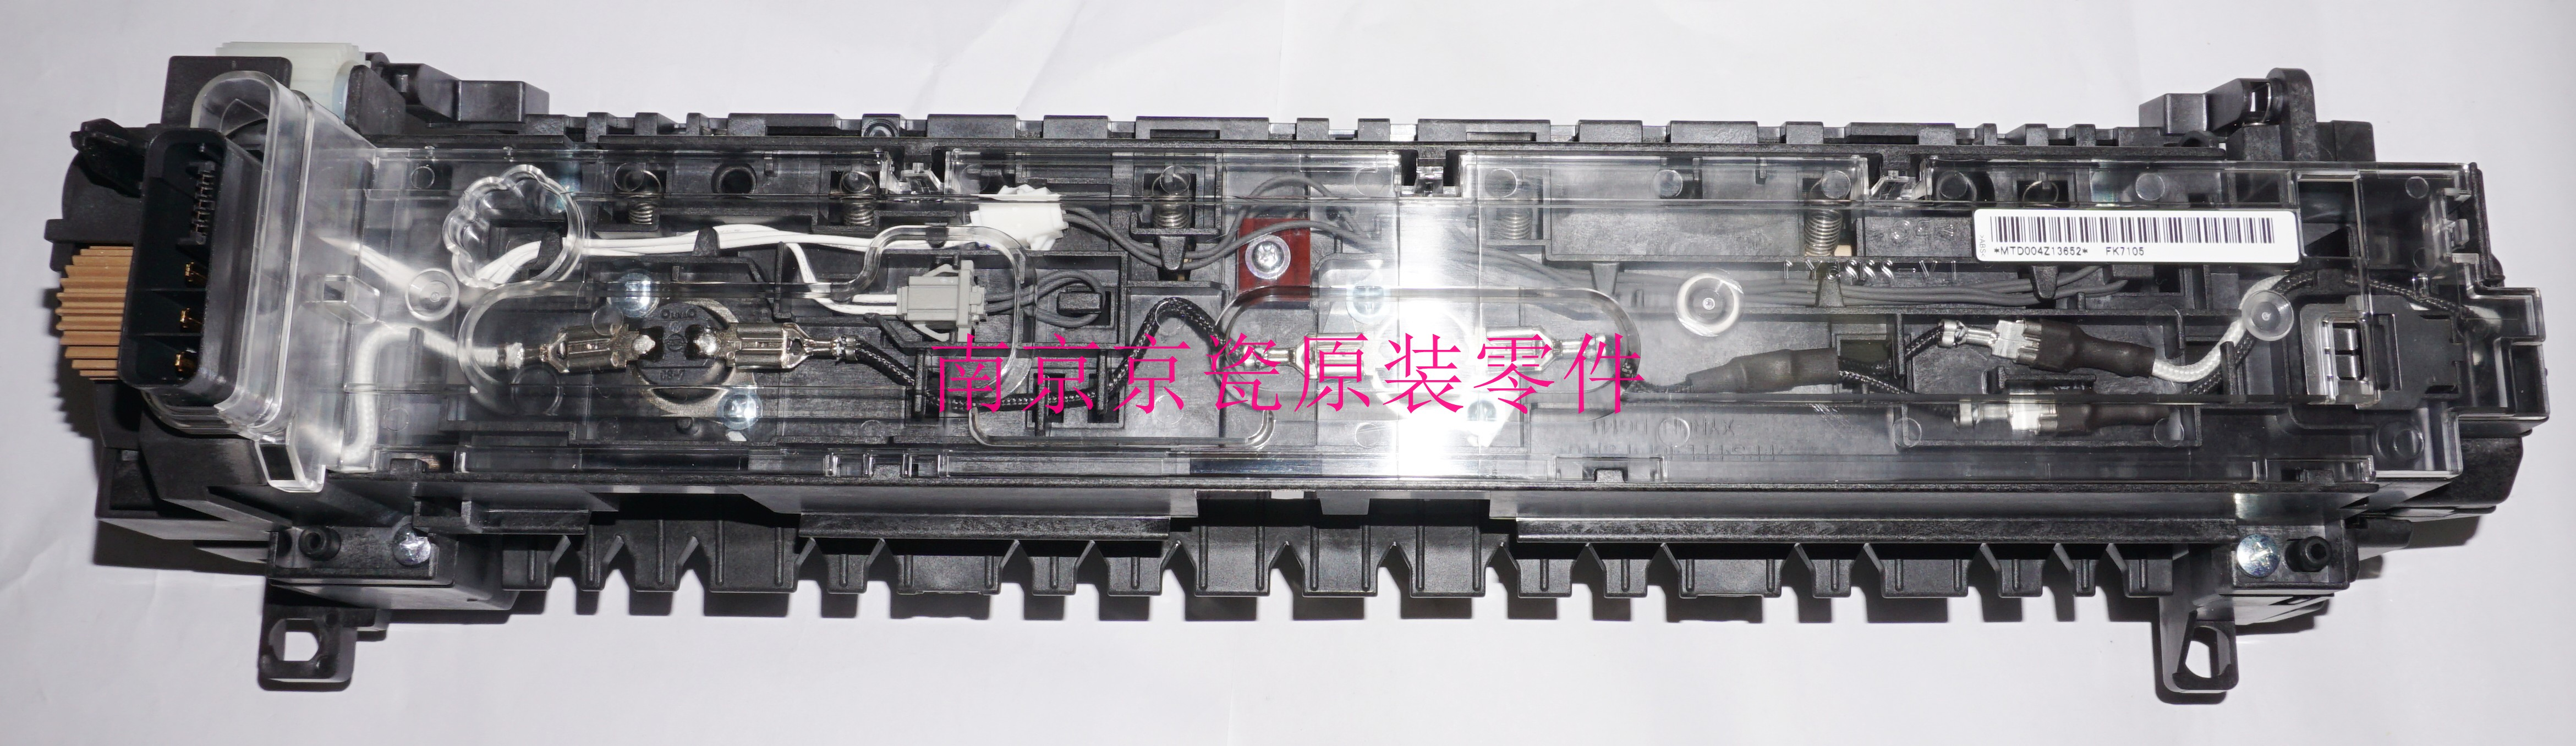 New original Kyocena TA3010 3510 3011 3511i FK-7105 fixed set